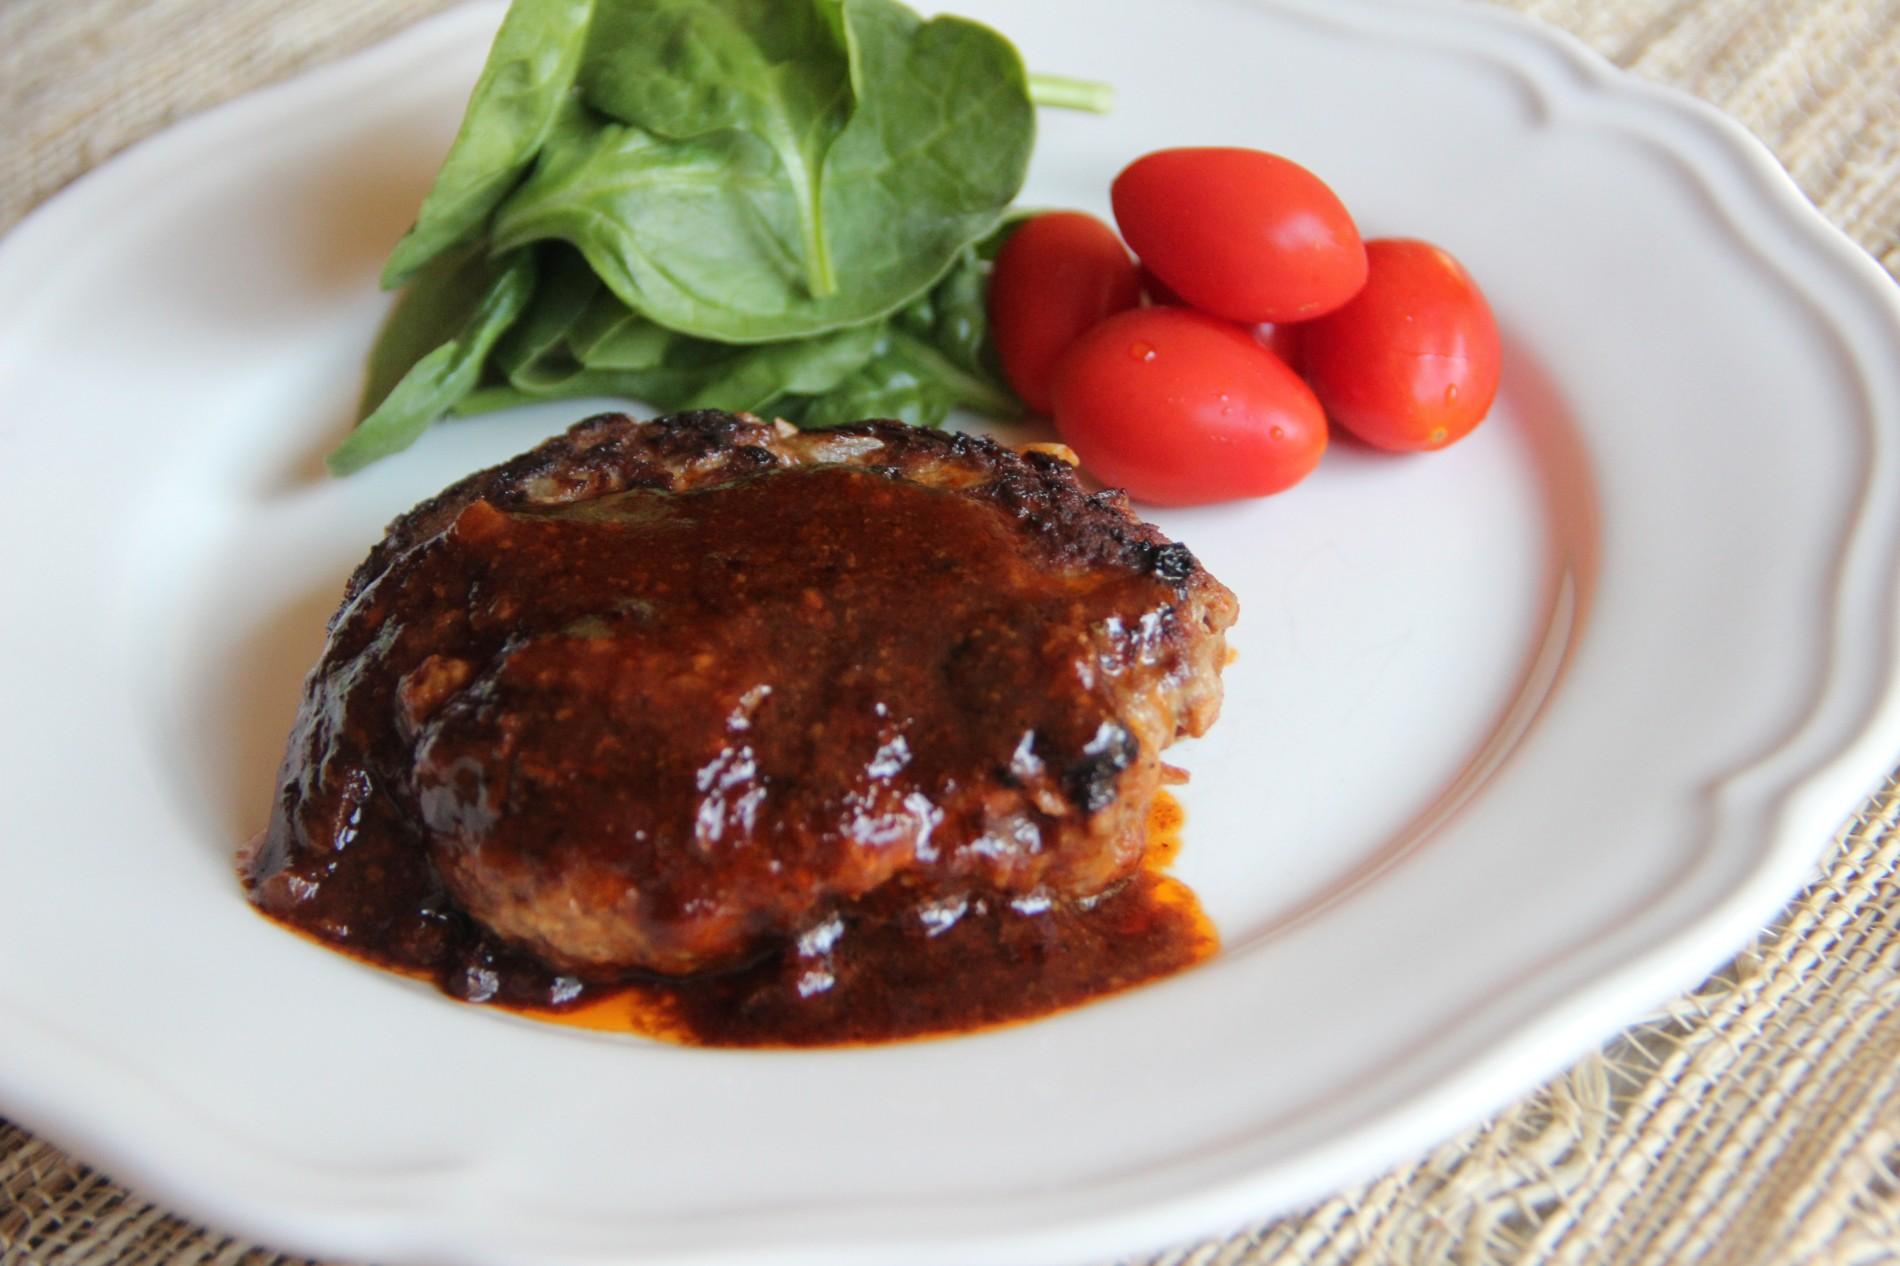 Hamburg Steak (Hambagu)